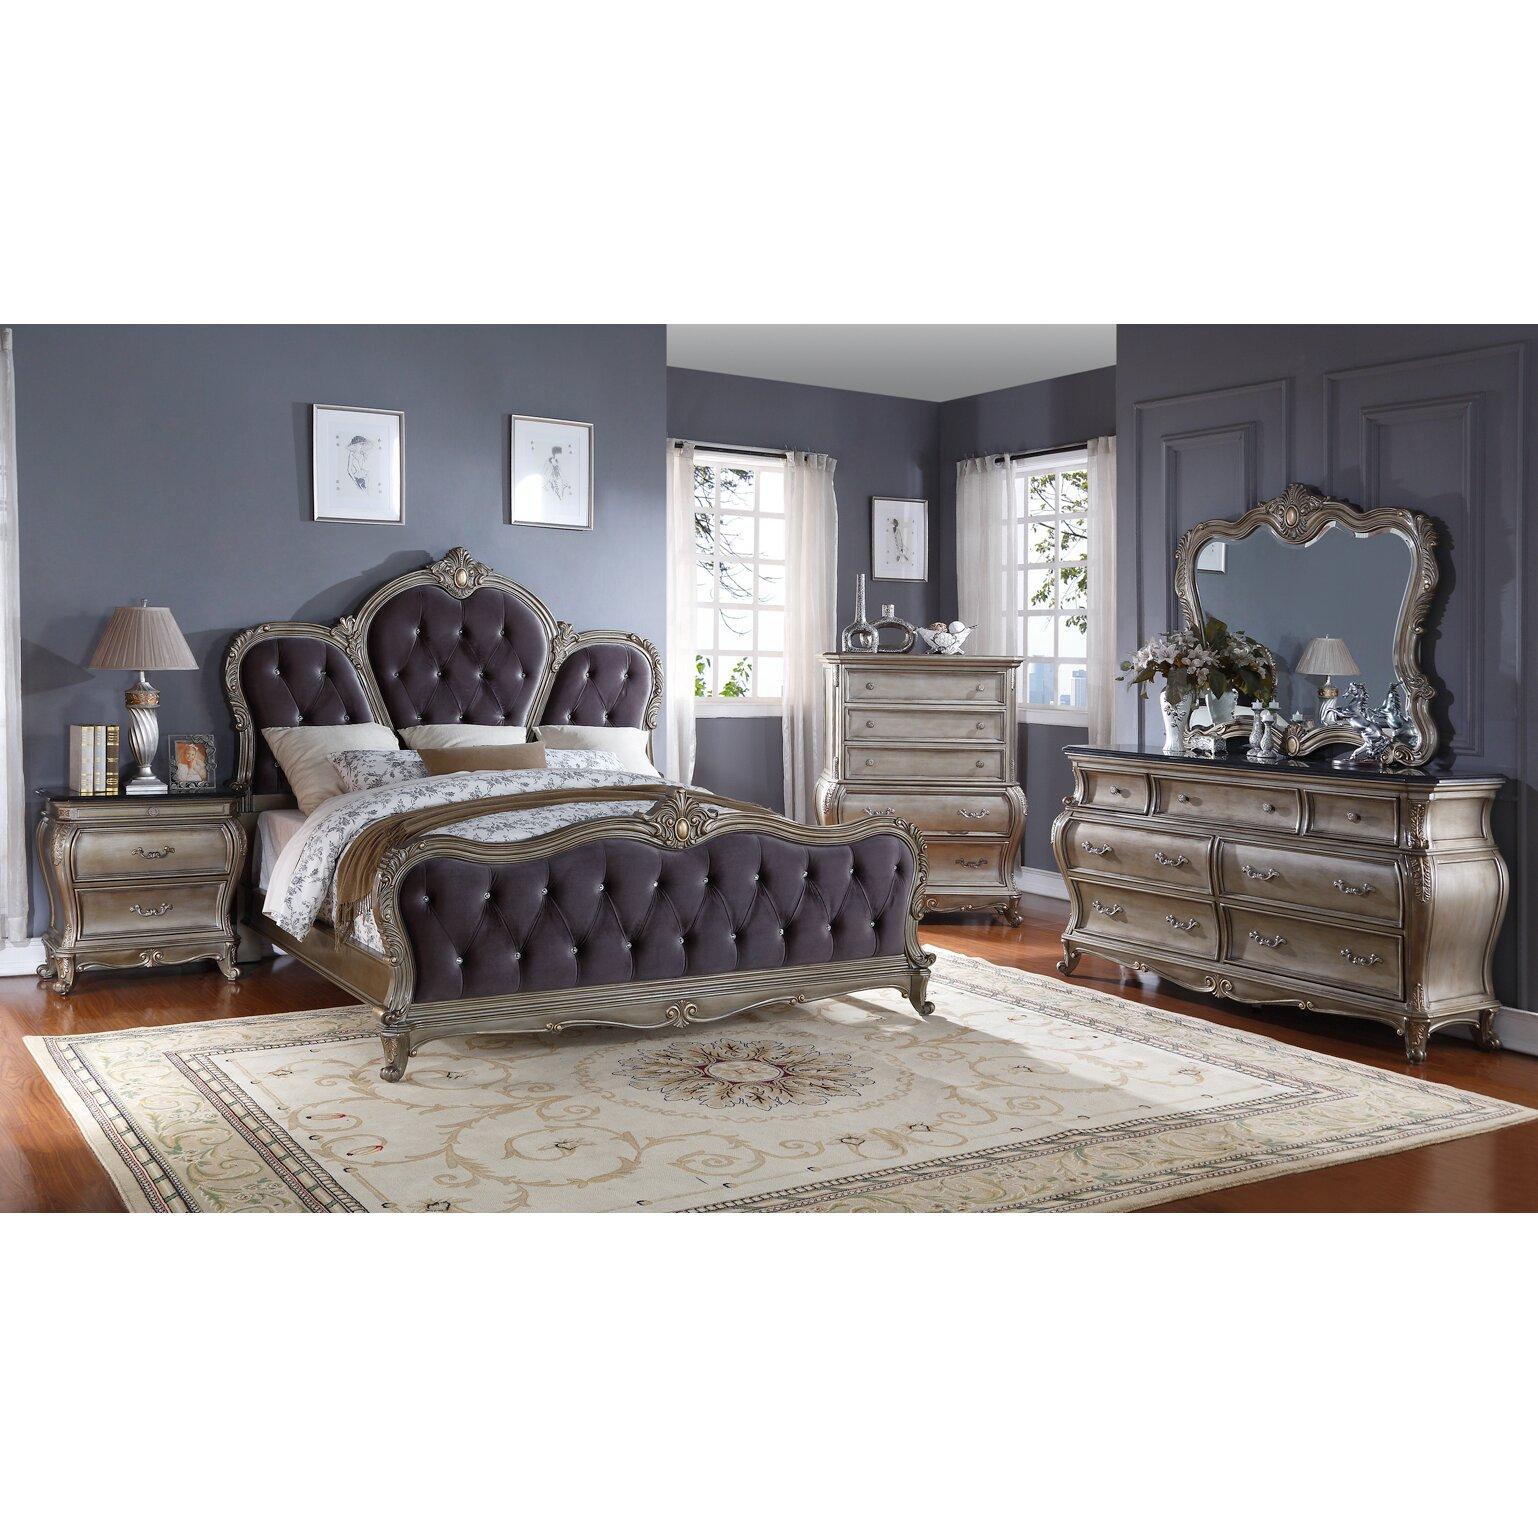 Meridian Furniture Usa Roma 2 Drawer Nightstand Reviews Wayfair